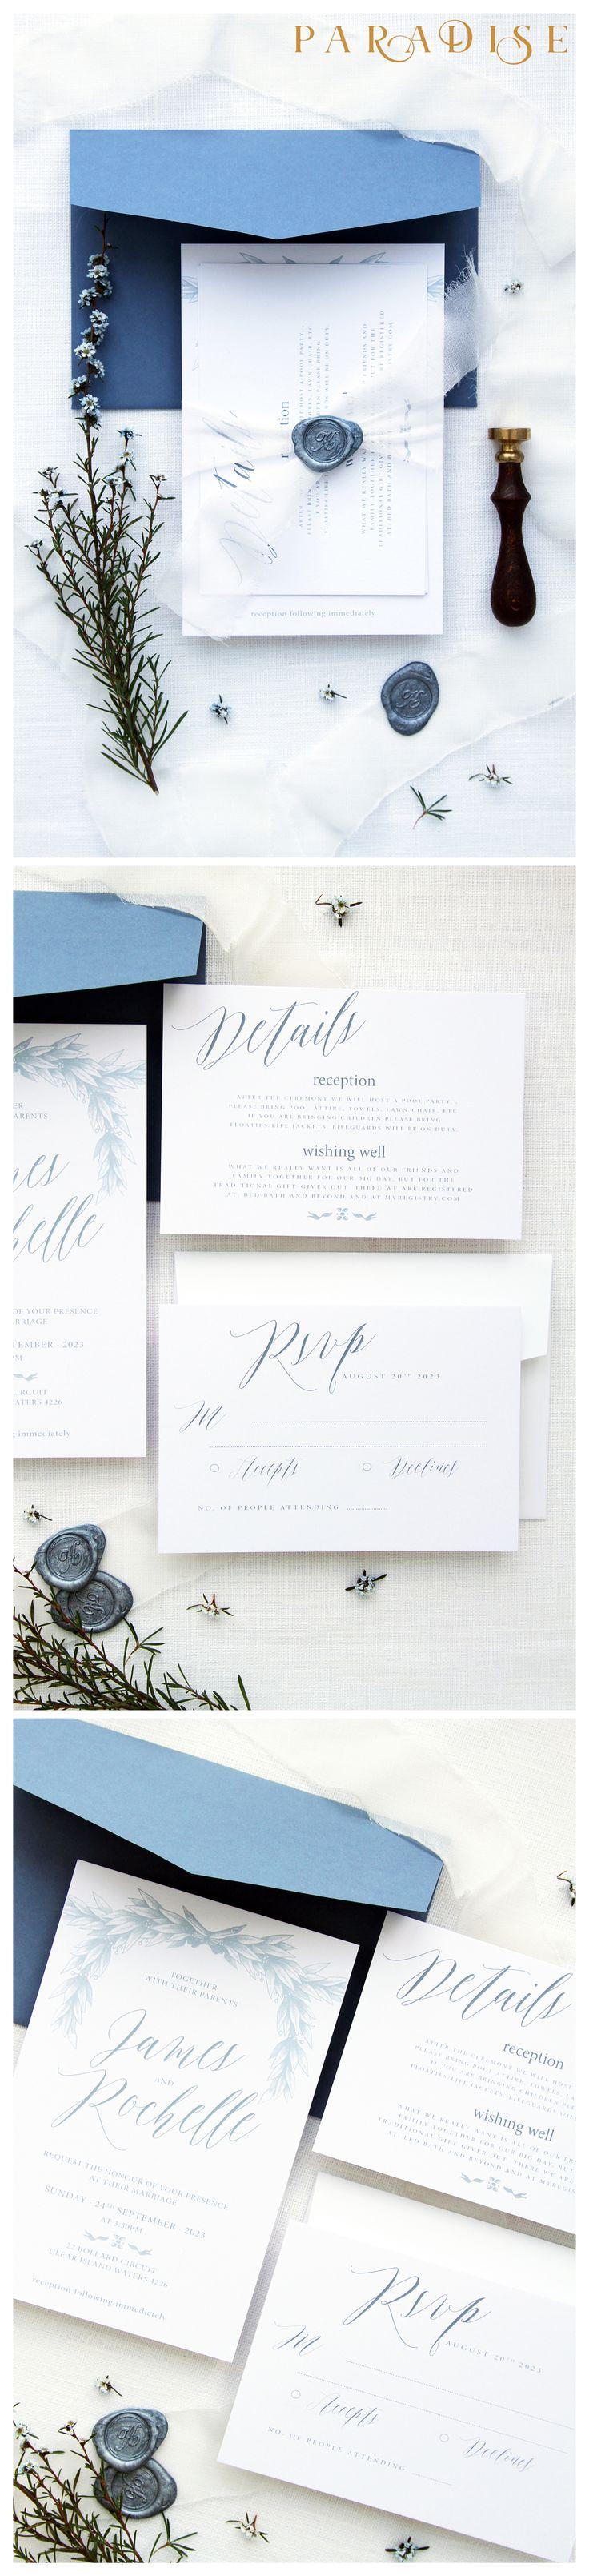 Rochelle Dusty Blue Wedding Invitation Sets, Wax Seal Invitations, Luxury Wedding Invitation, Silk Belly Band, Wax Stamp Invitations #weddinginvitation #weddings #bride #weddingstationery #weddinginvitations #weddingtrends #weddinginspo #weddingstyle